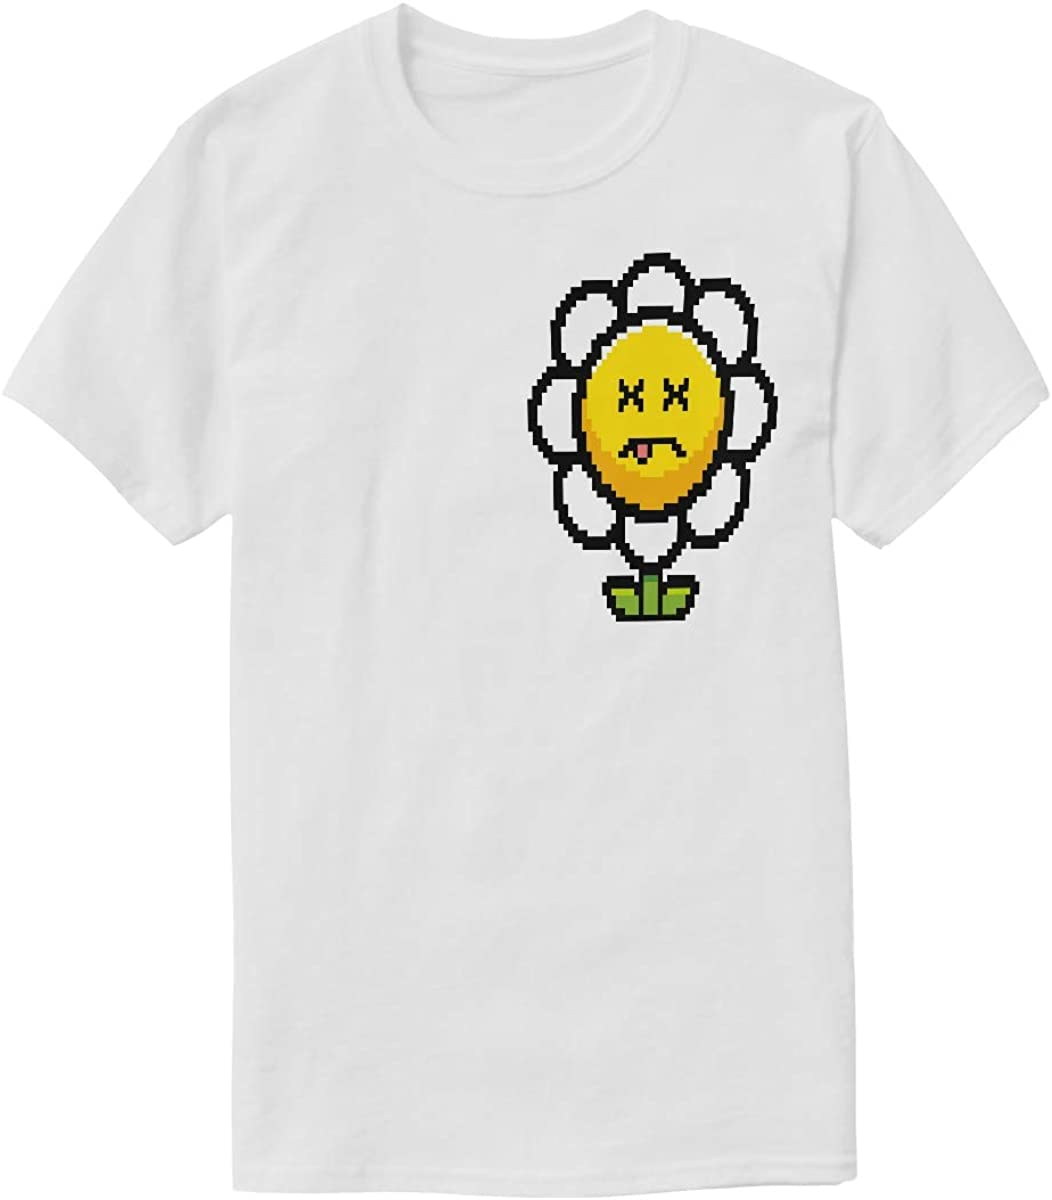 Round Neck T-Shirt,Exotic Hawaiian Summer Season Fashion Personality Customization